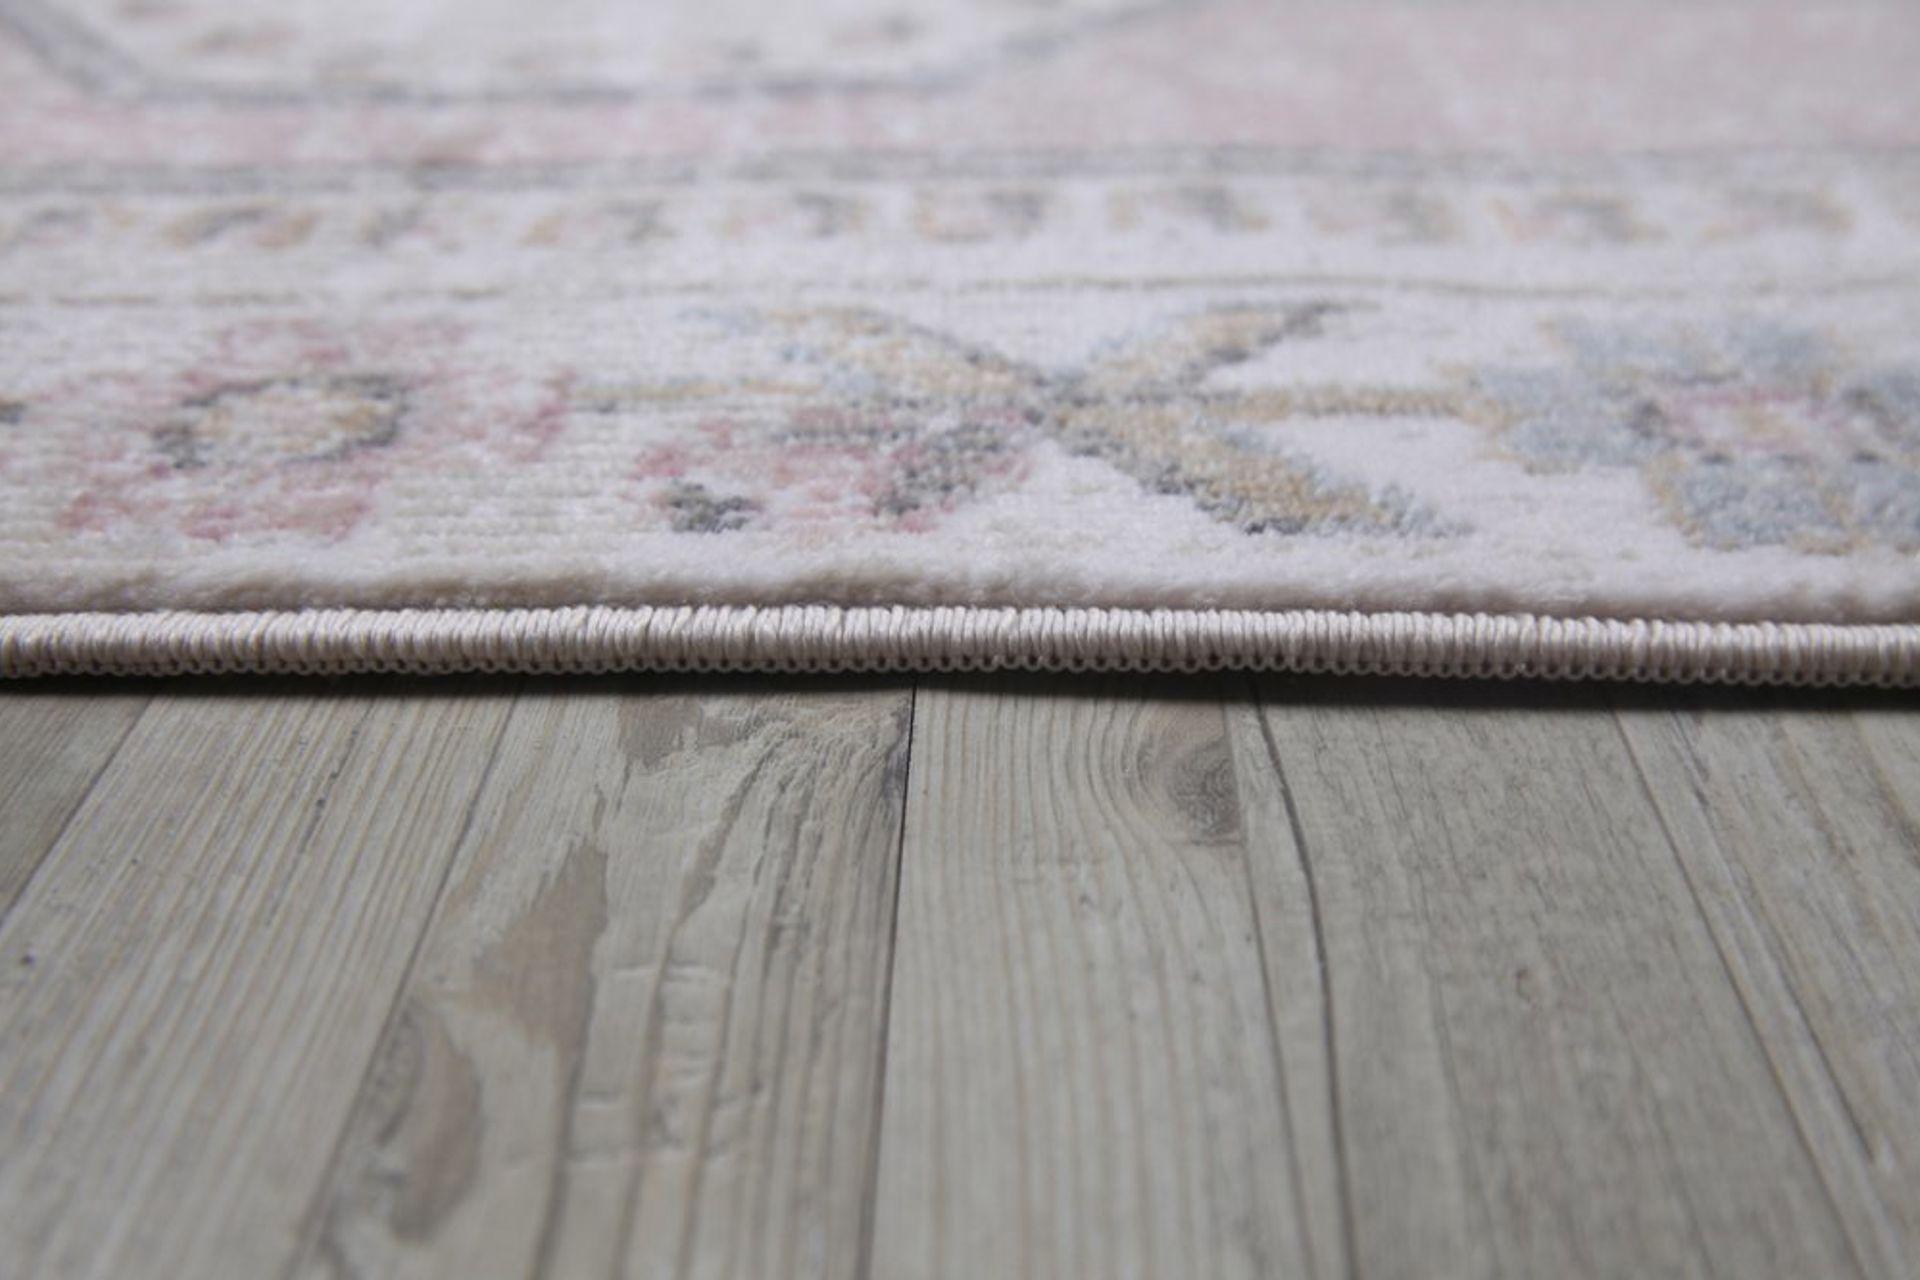 Aurora Traditional Antique Rug, 160 x 230, Grey & Pink